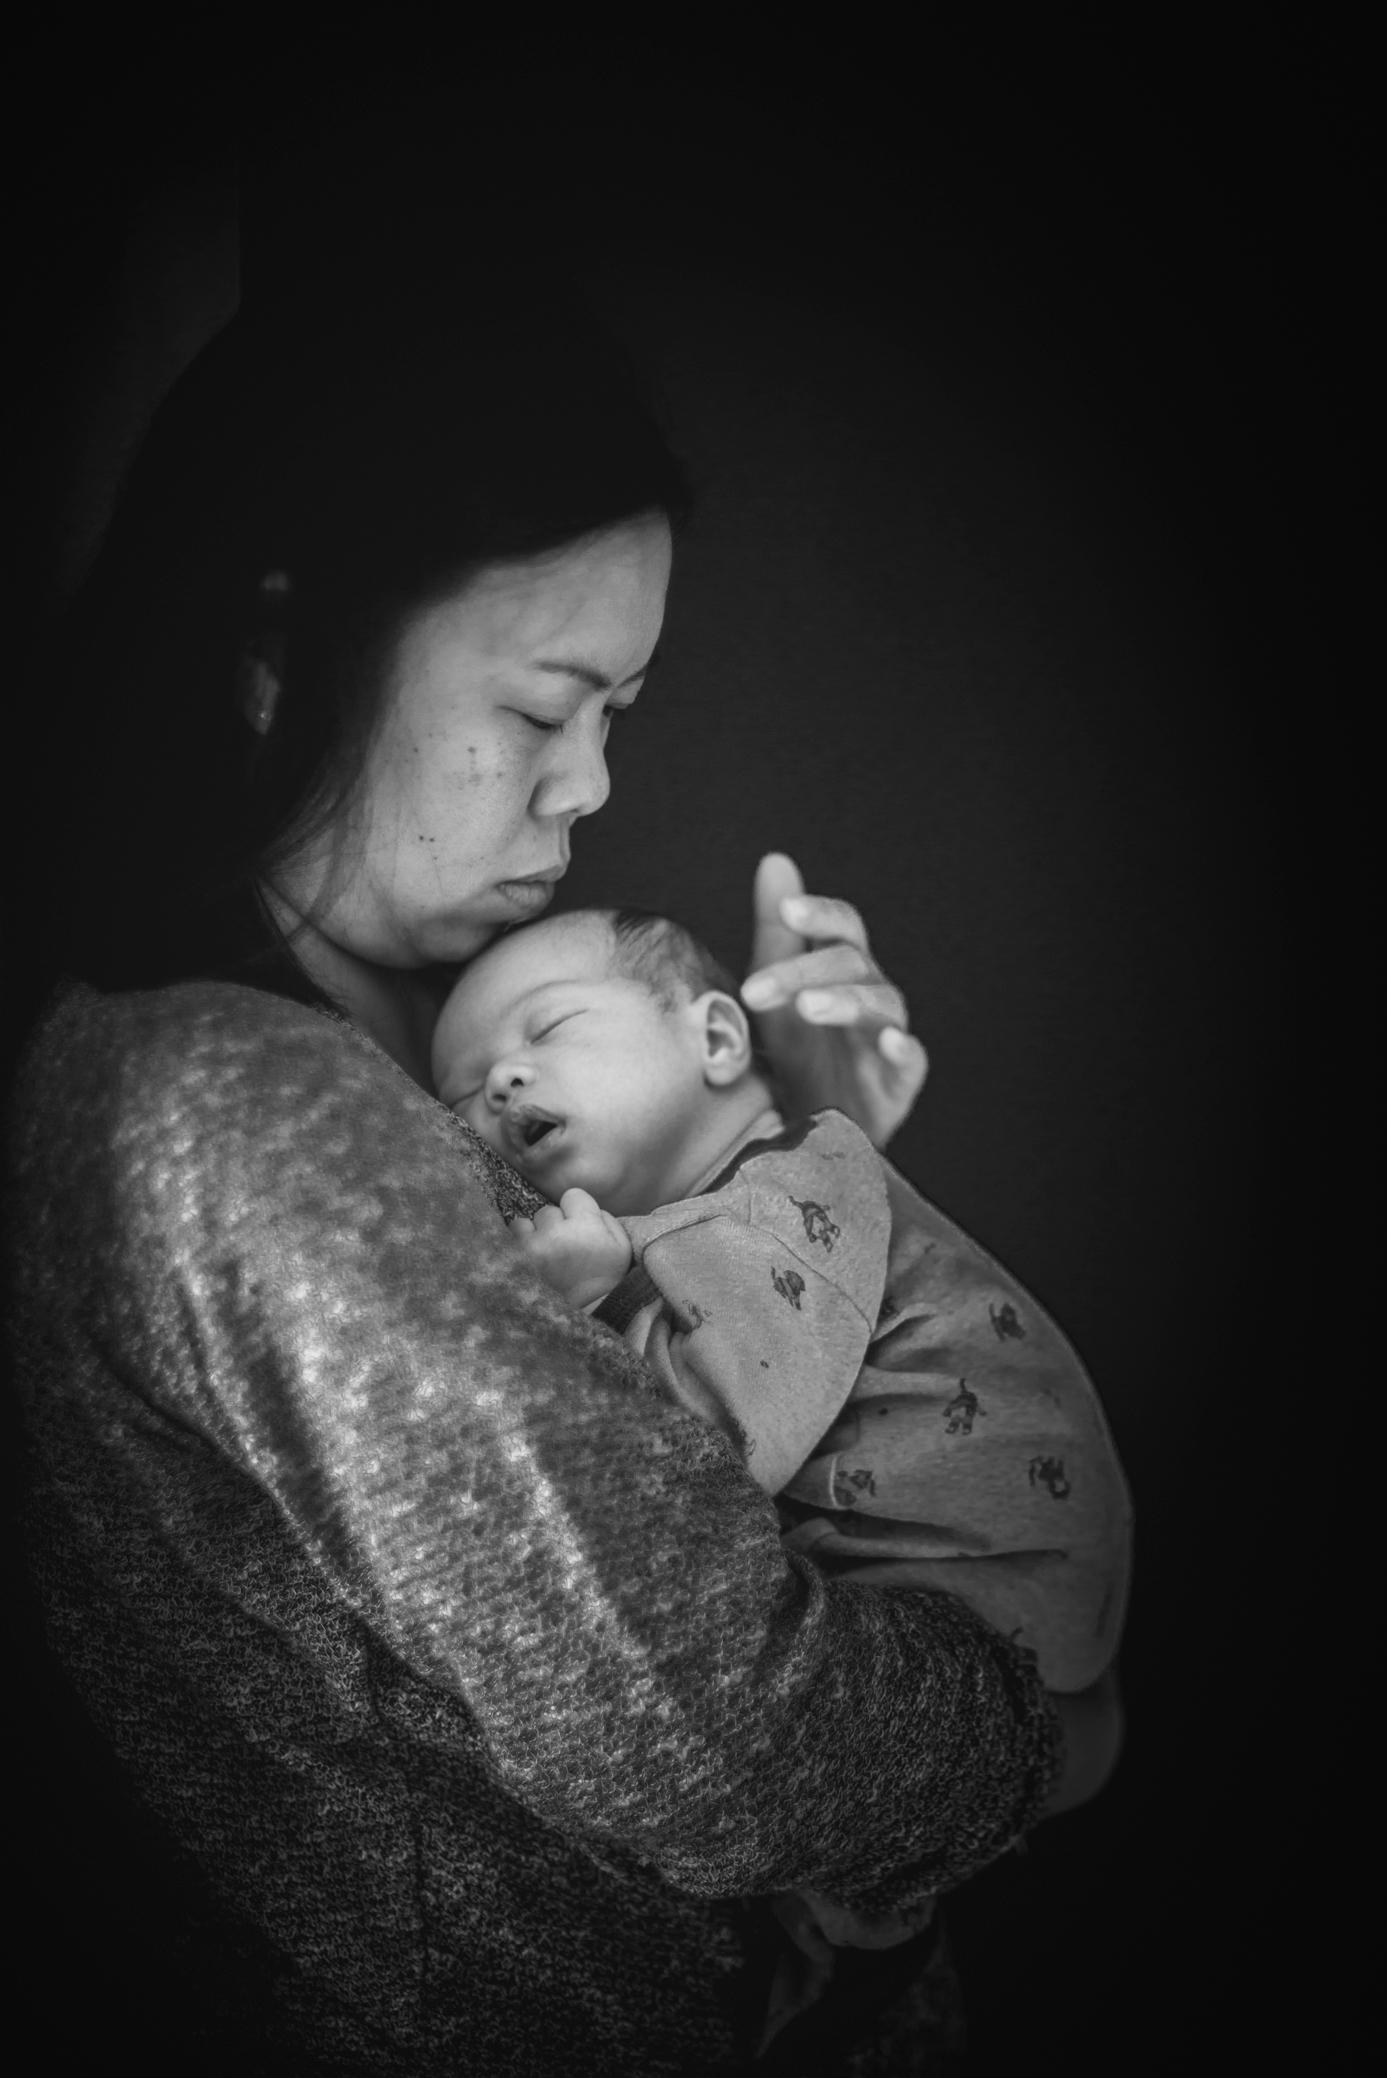 Newborn lifestyle photography | Cindy Cavanagh